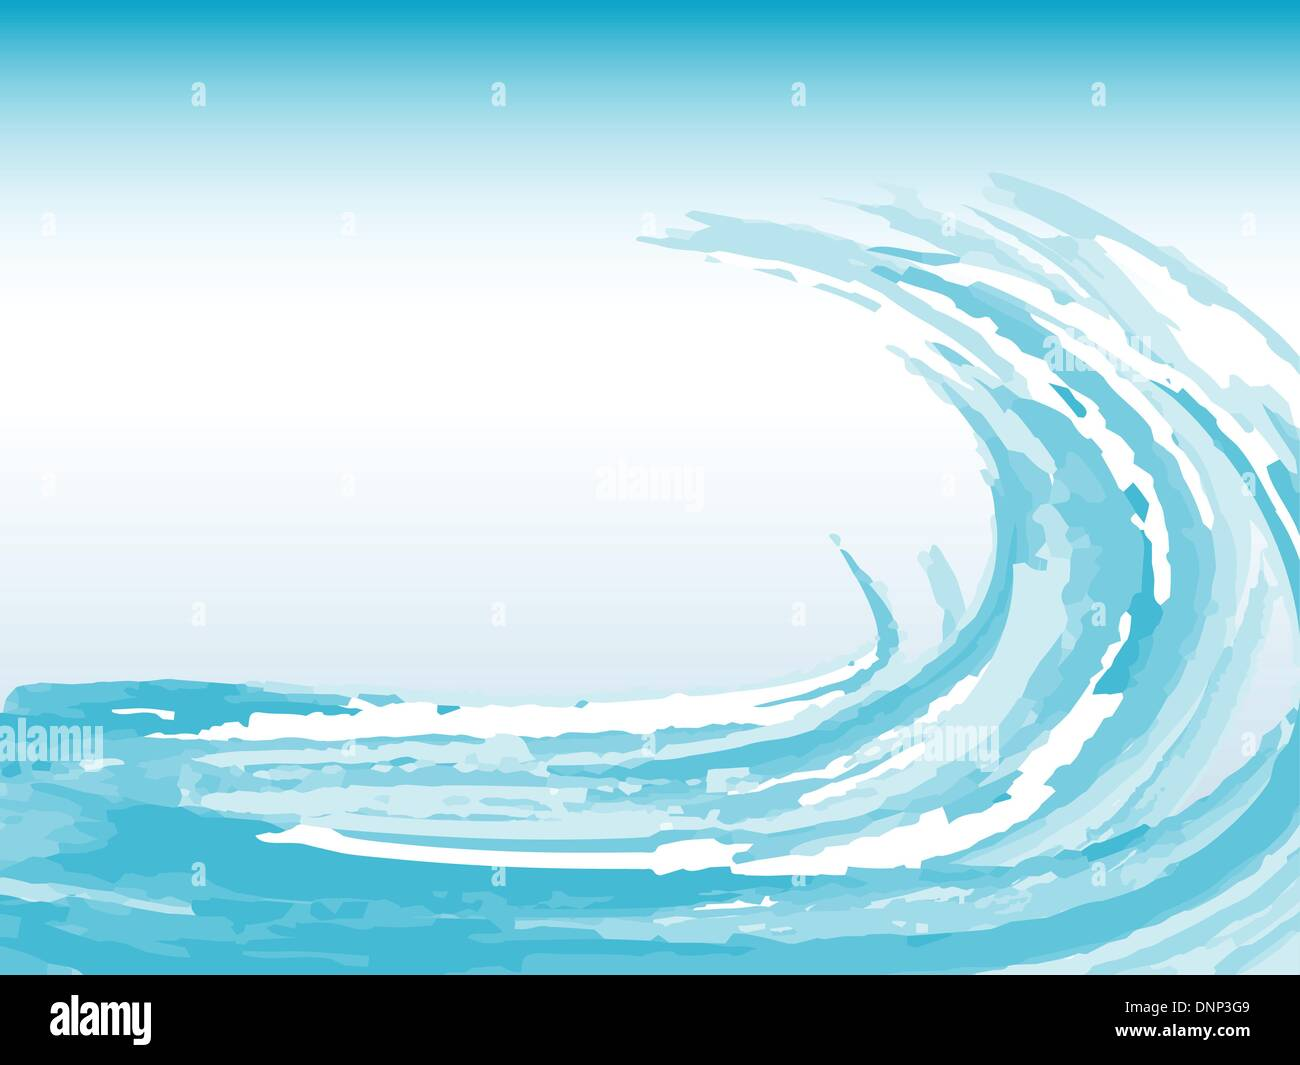 Resumen Antecedentes de onda Imagen De Stock